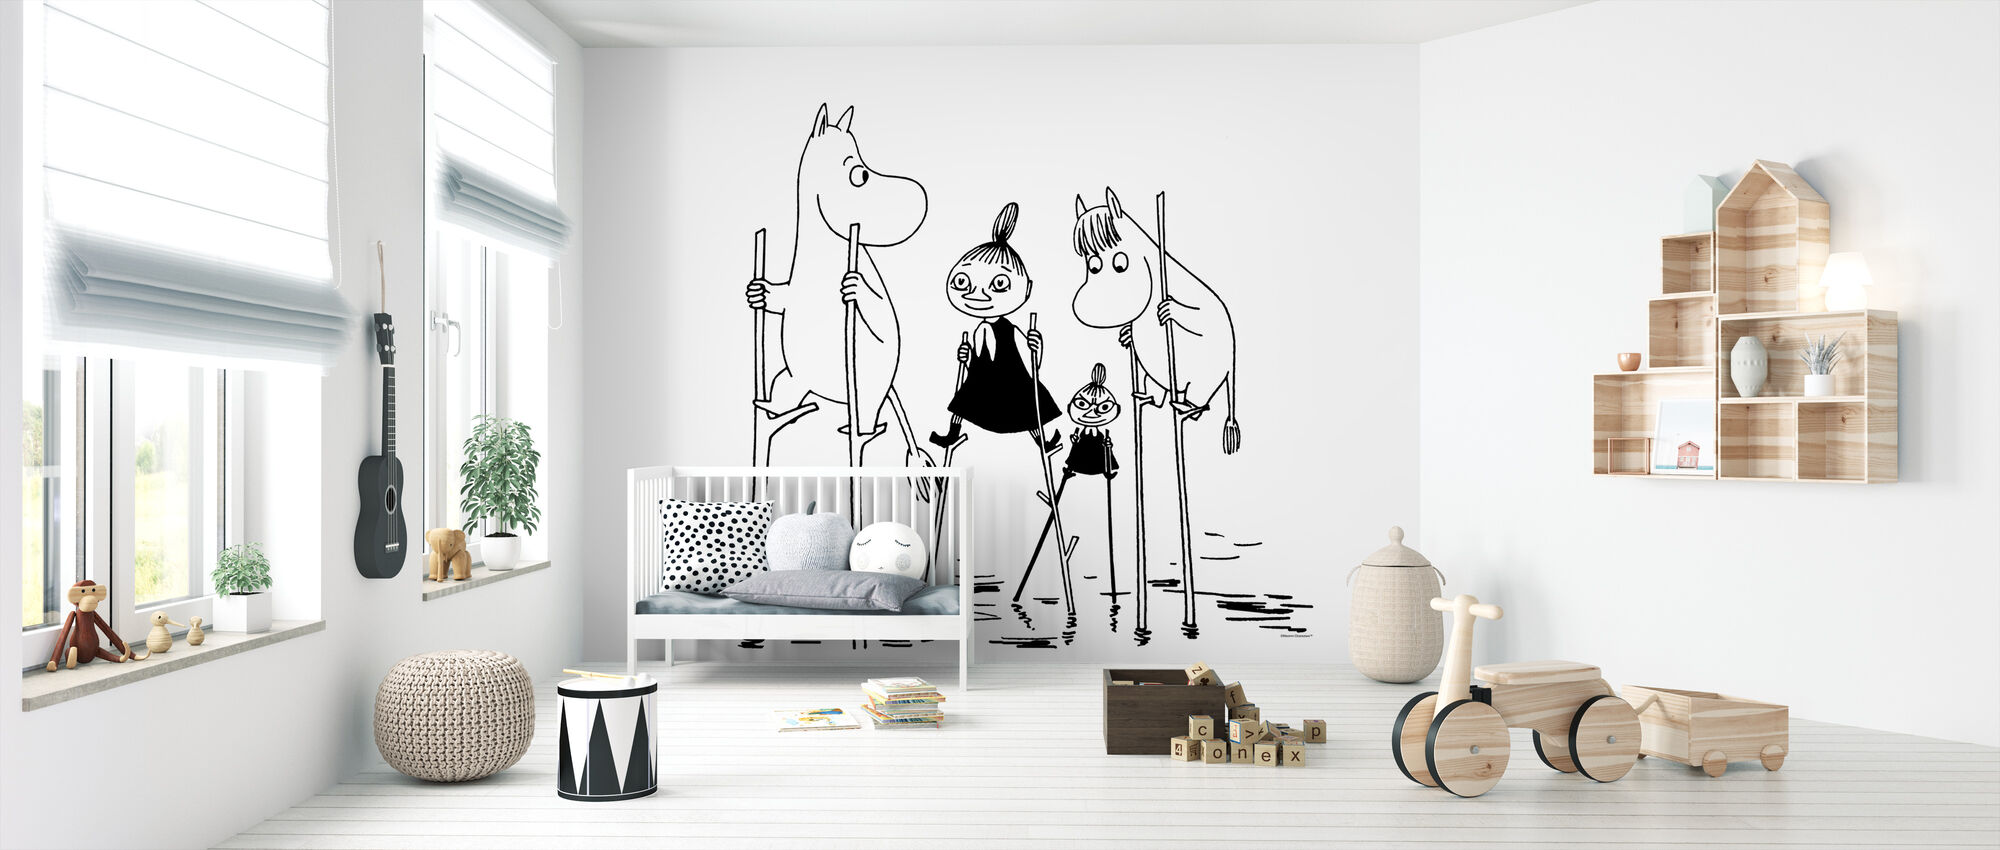 Moomin - Trésors perdus en mer - Papier peint - Chambre de bébé